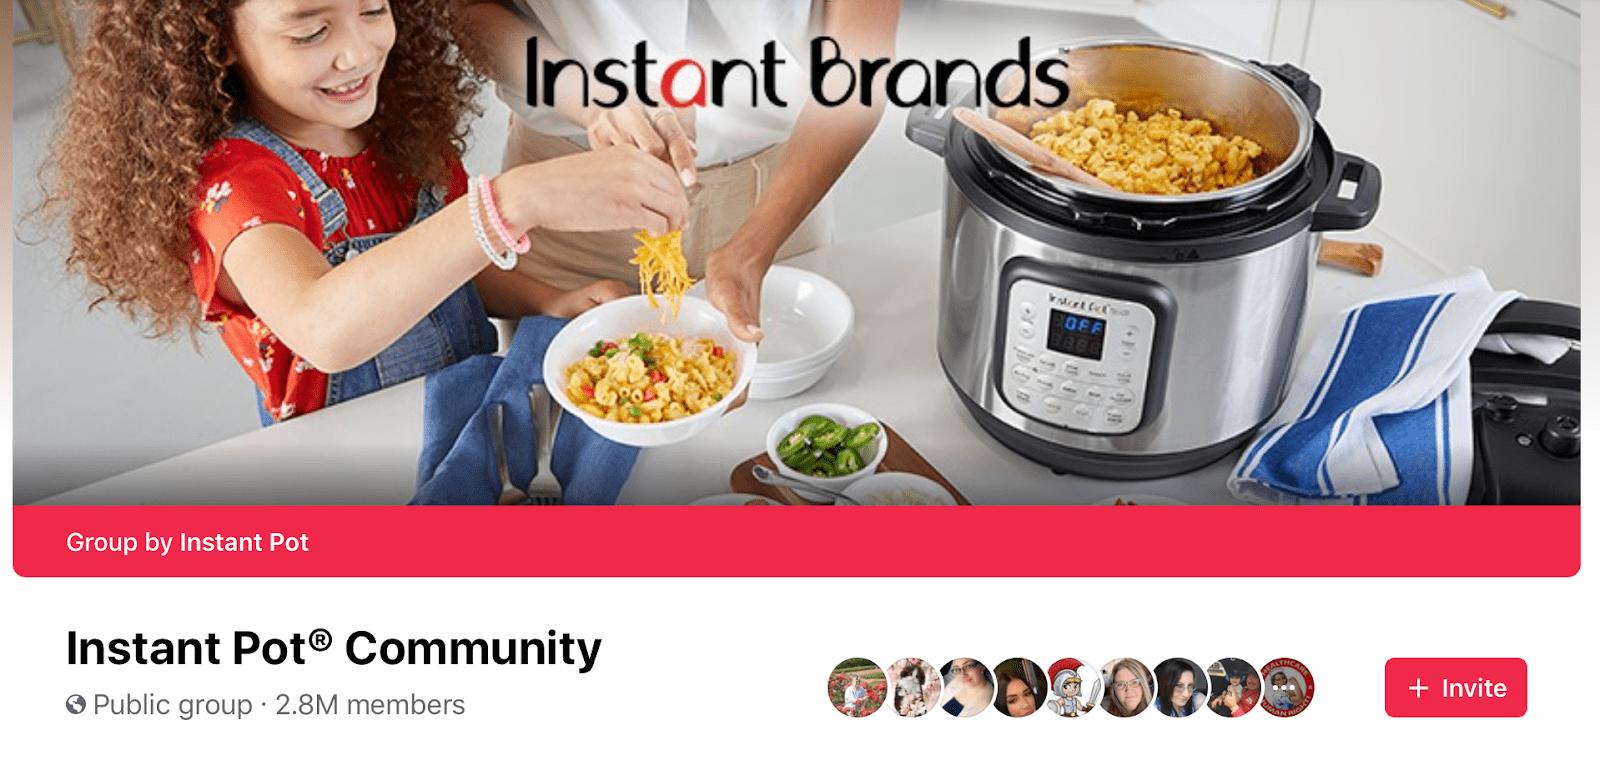 Instant Brands Community